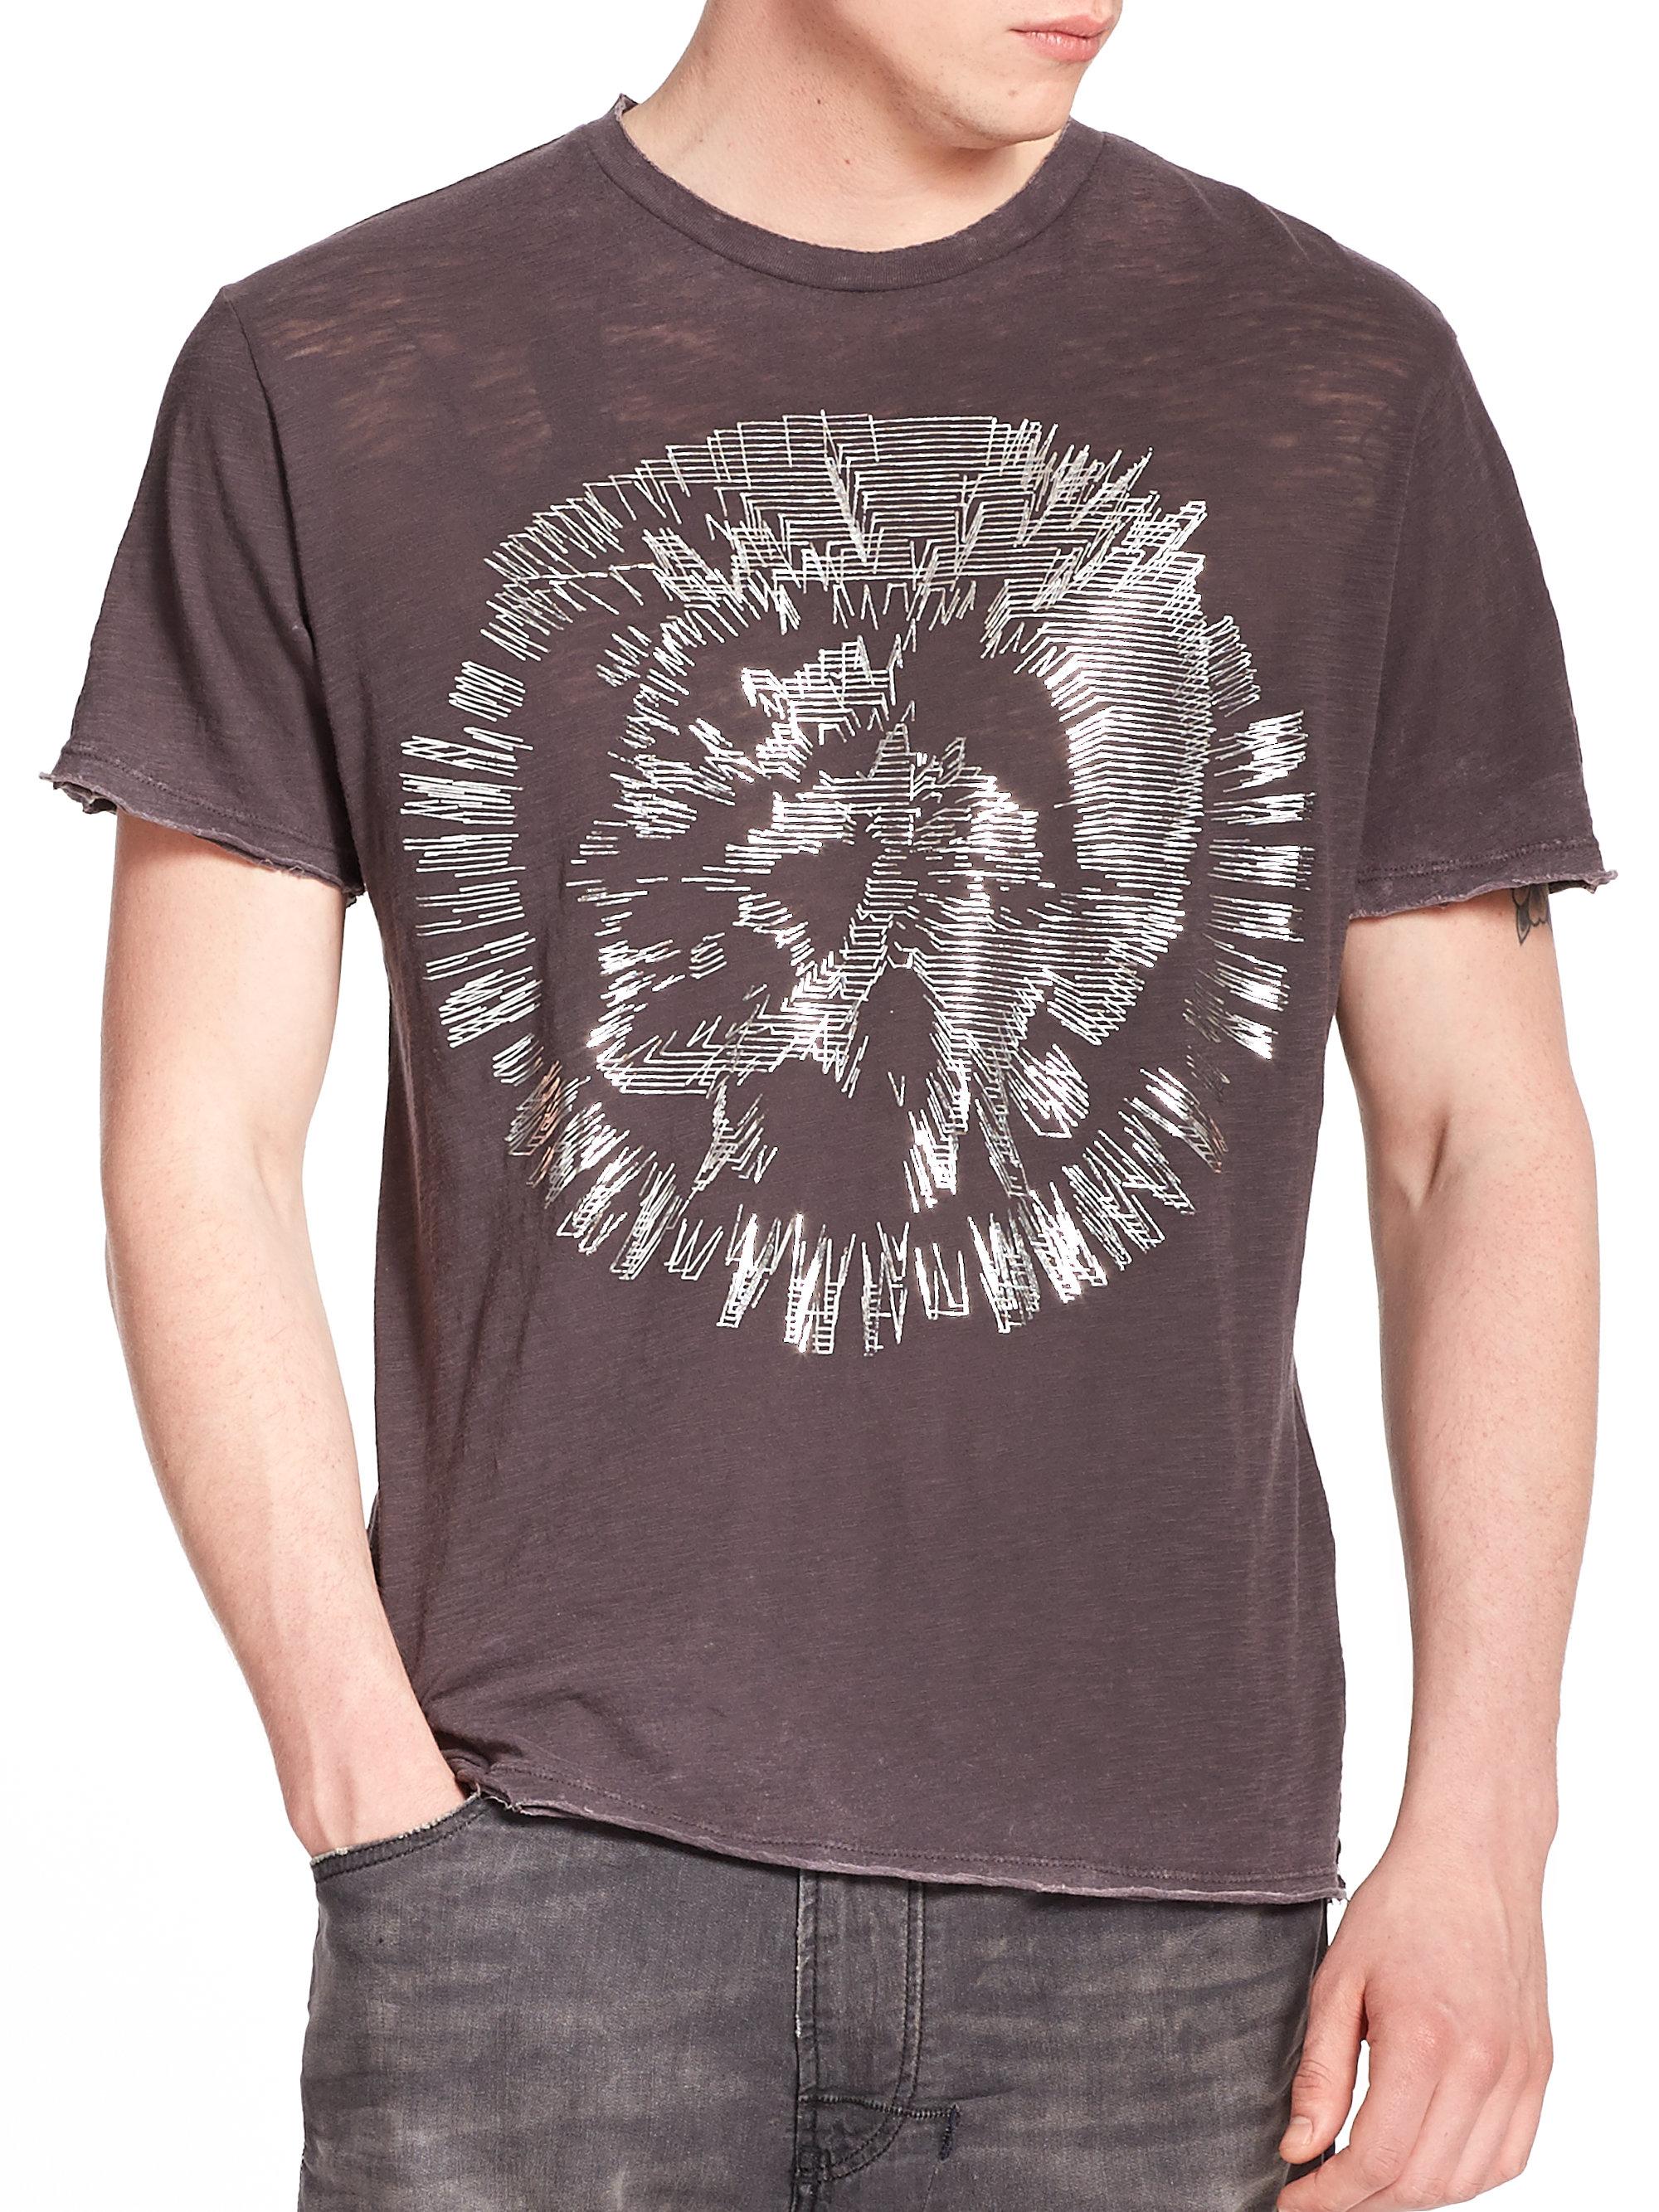 Denim T Shirts For Men